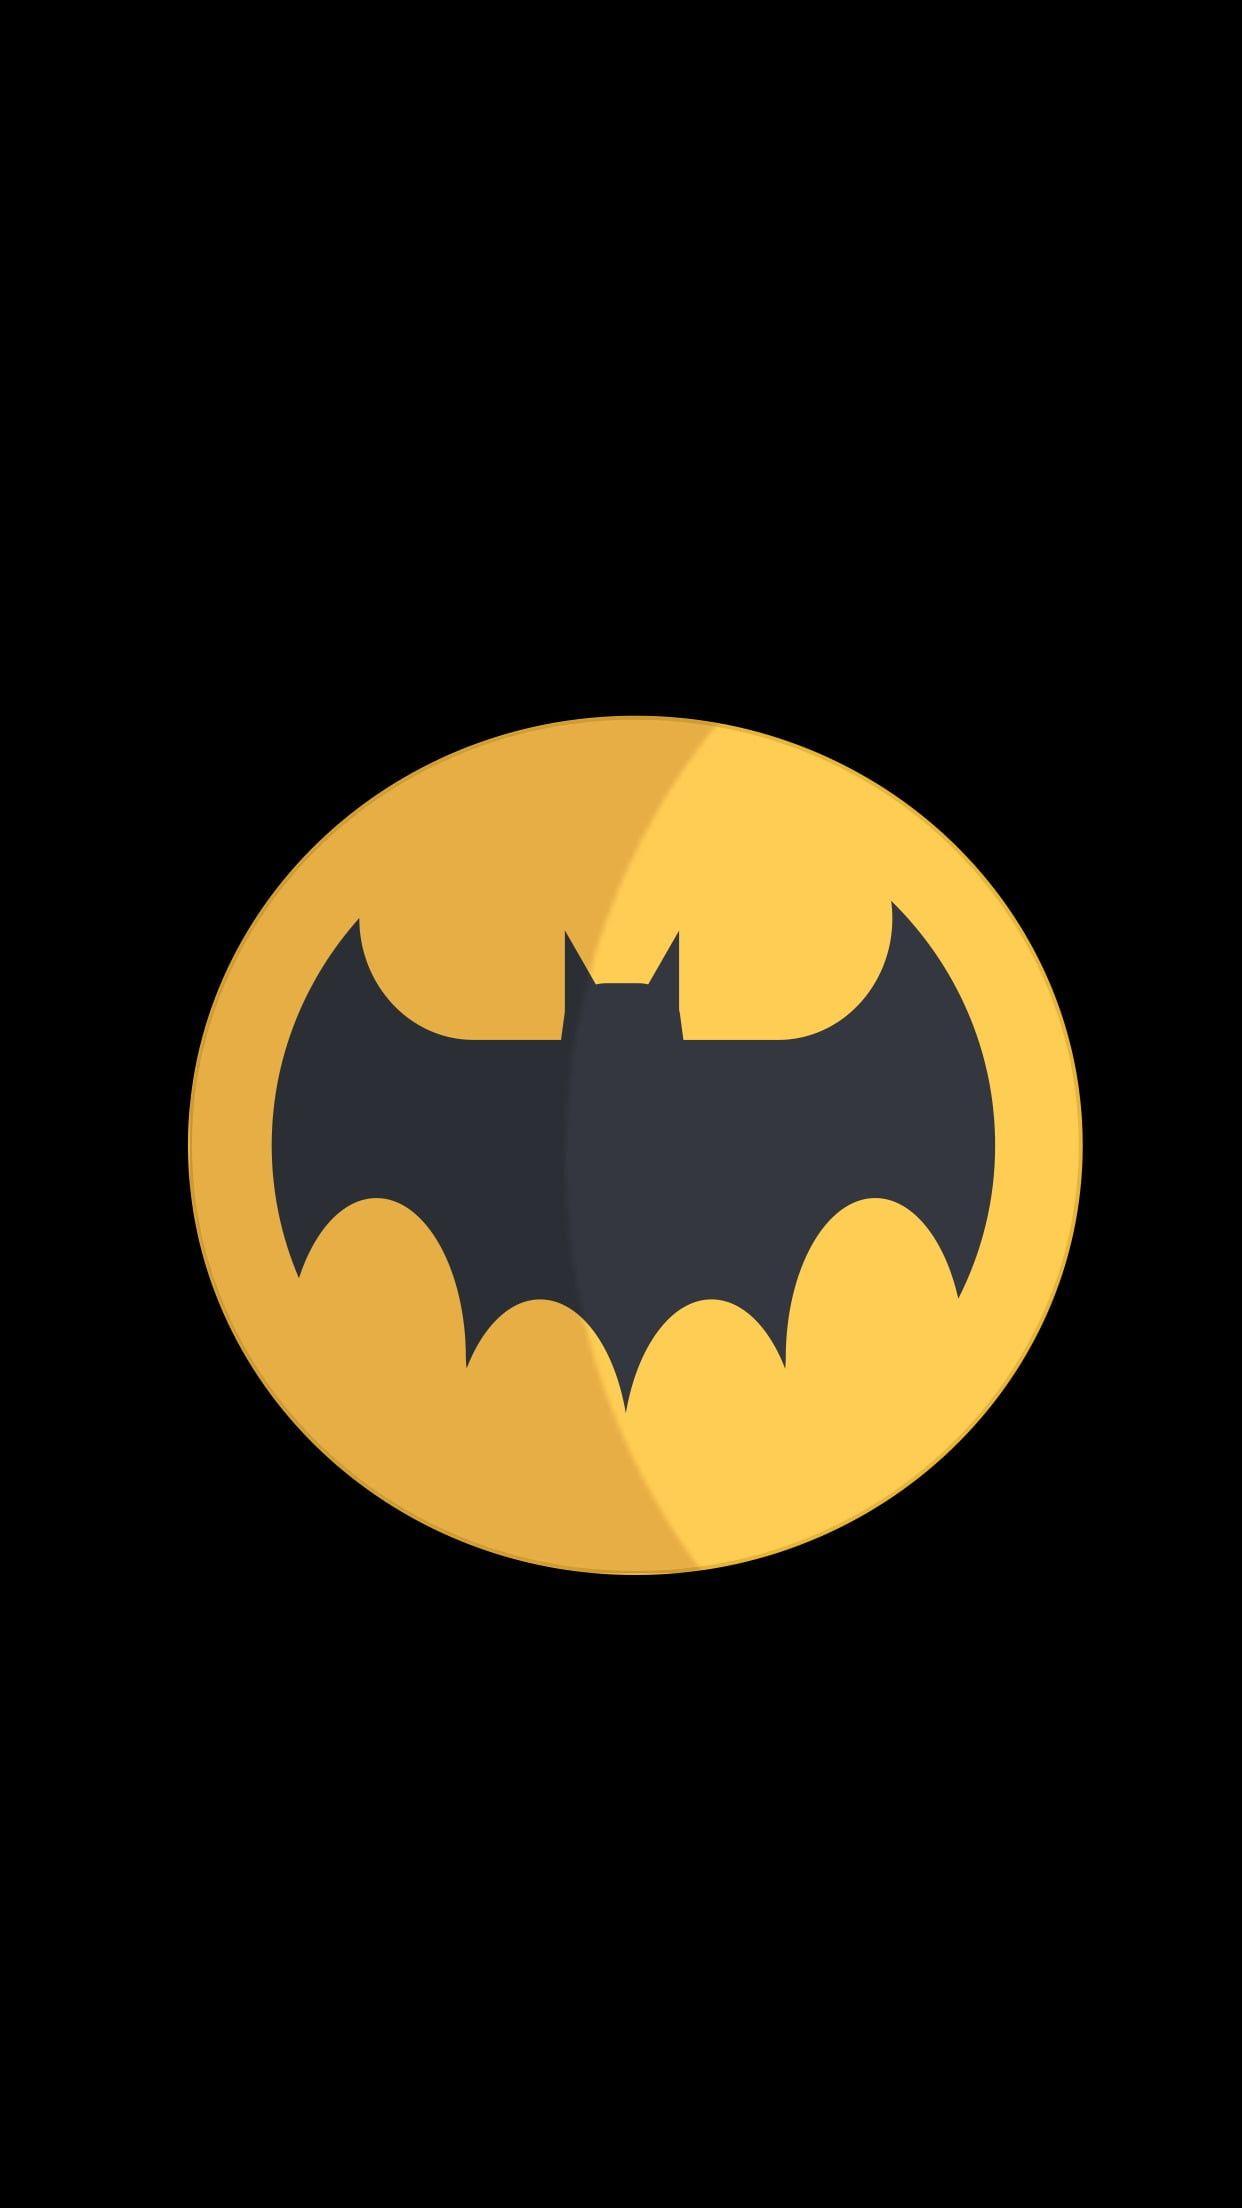 Batman Logo Material Minimal 1080p Wallpaper Hdwallpaper Desktop Batman Artwork Batman Wallpaper Superhero Wallpaper 1080p android mobile batman hd wallpaper